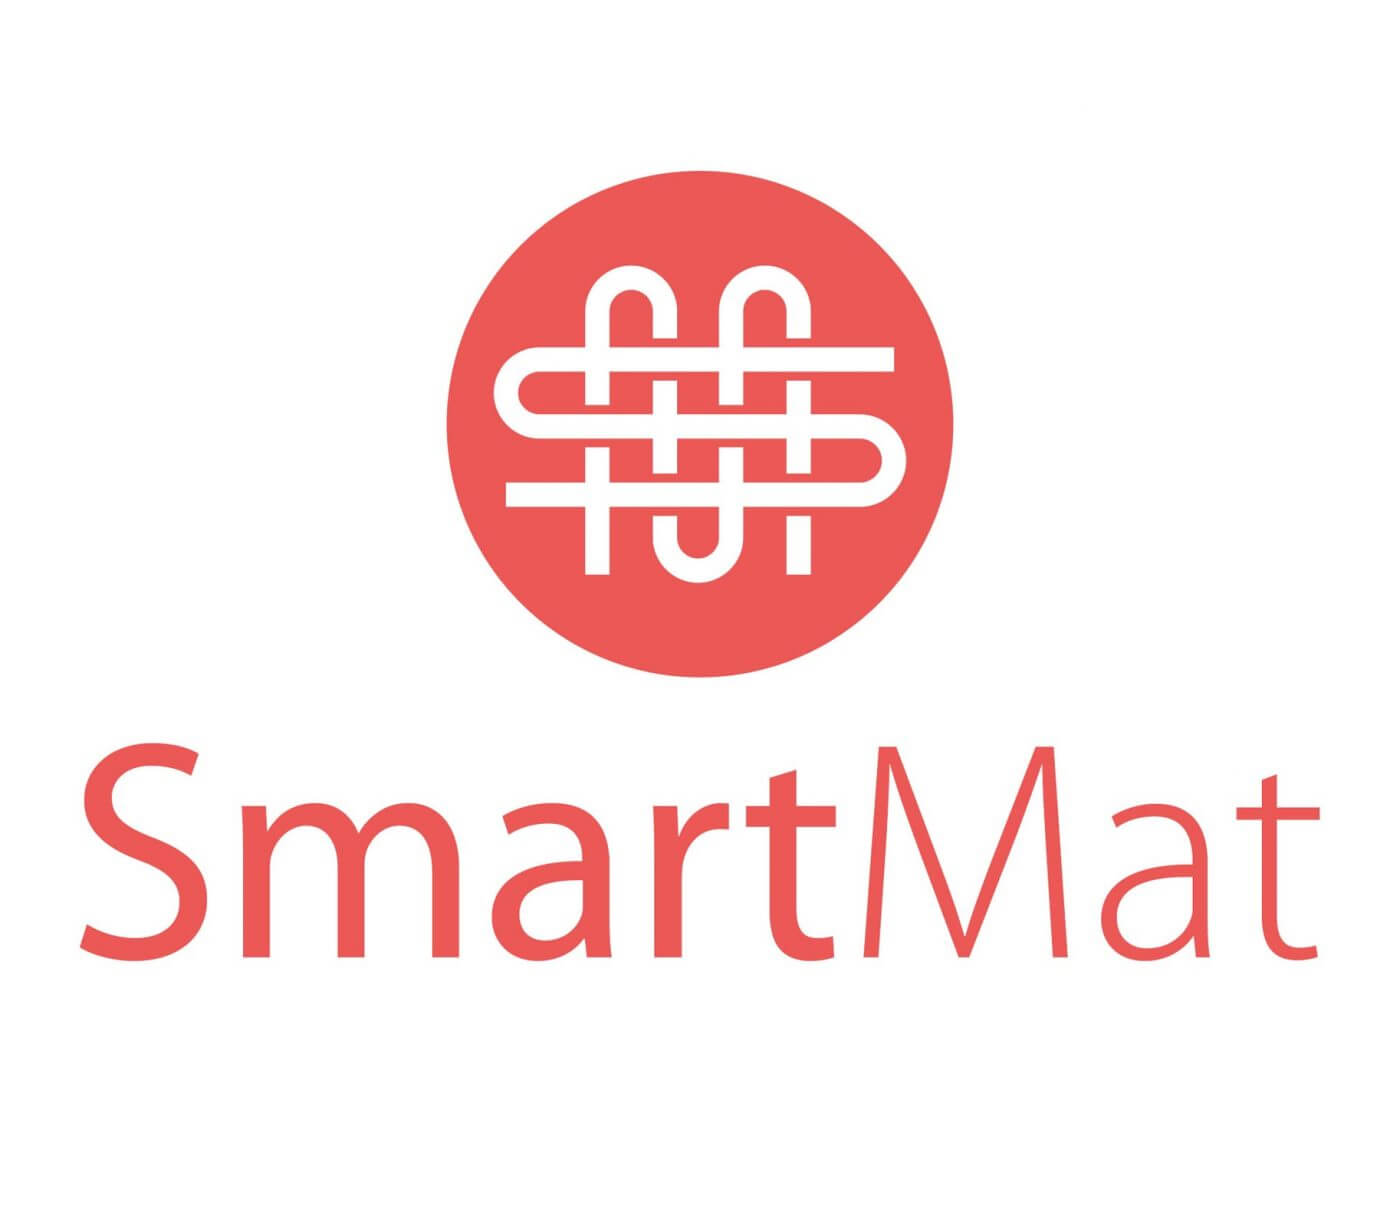 smartmat logo